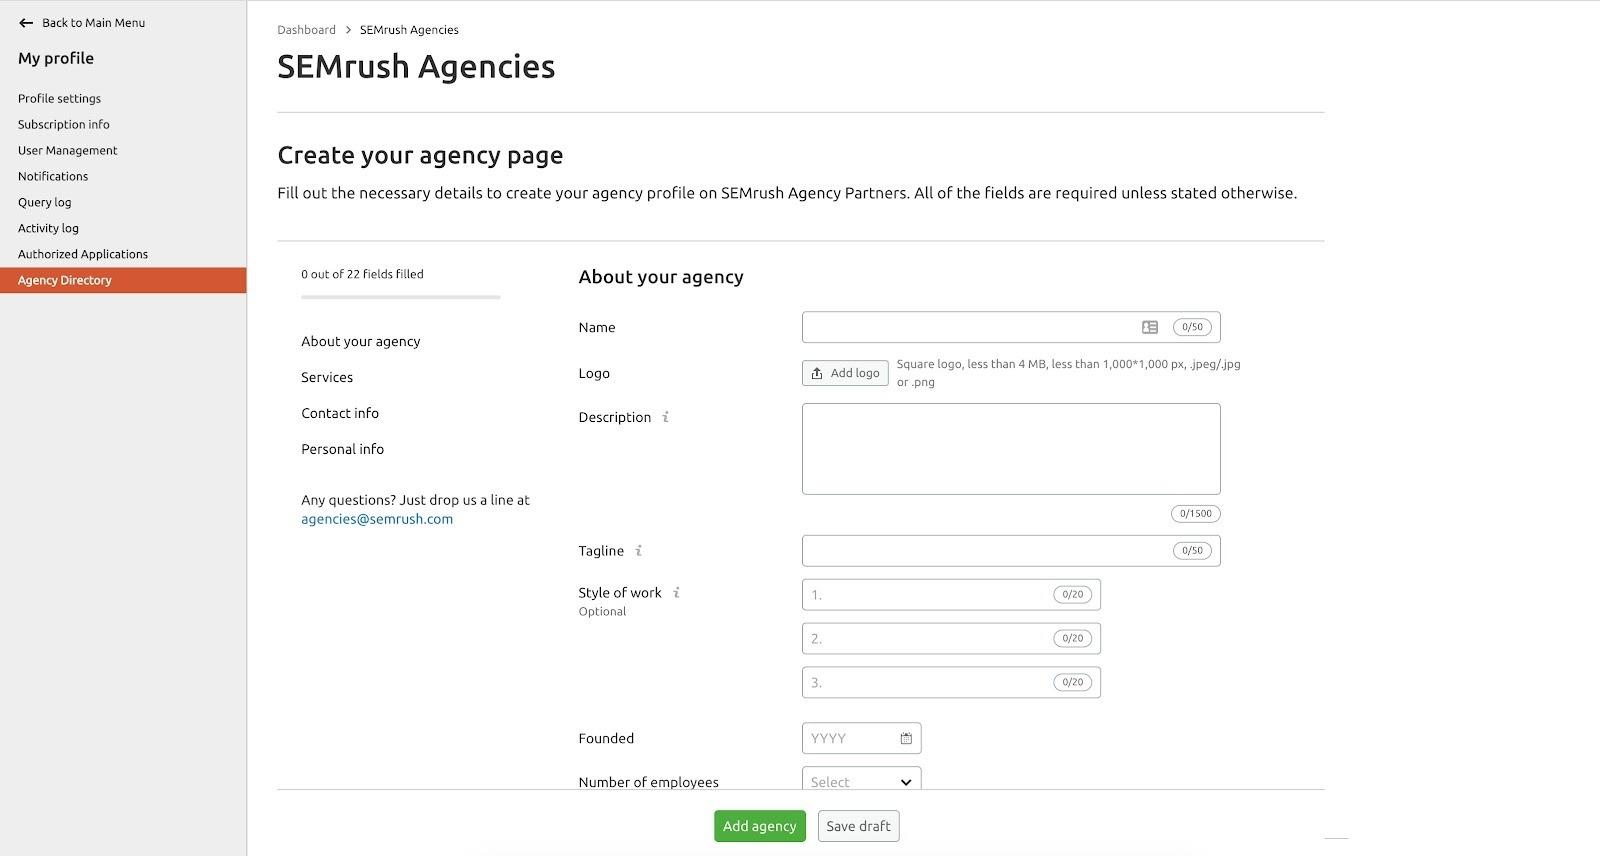 Agency Partners Platform image 2